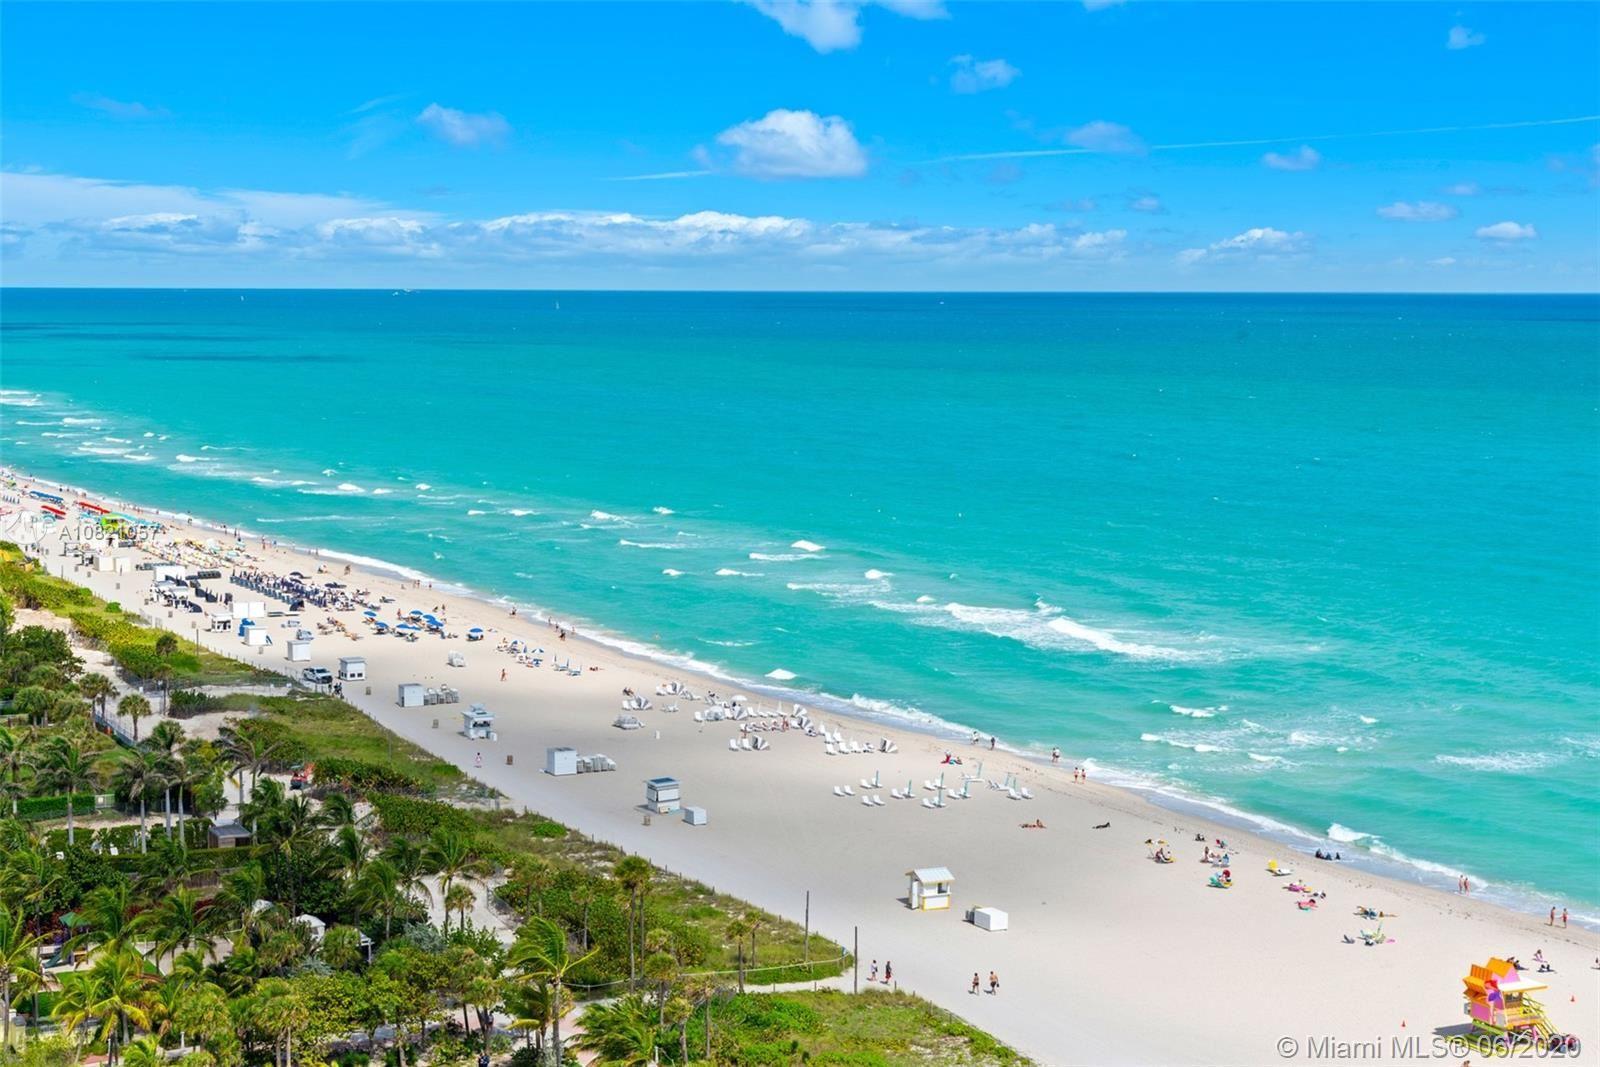 Photo 6 of Listing MLS a10821057 in 3315 Collins Ave #PH-B Miami Beach FL 33140